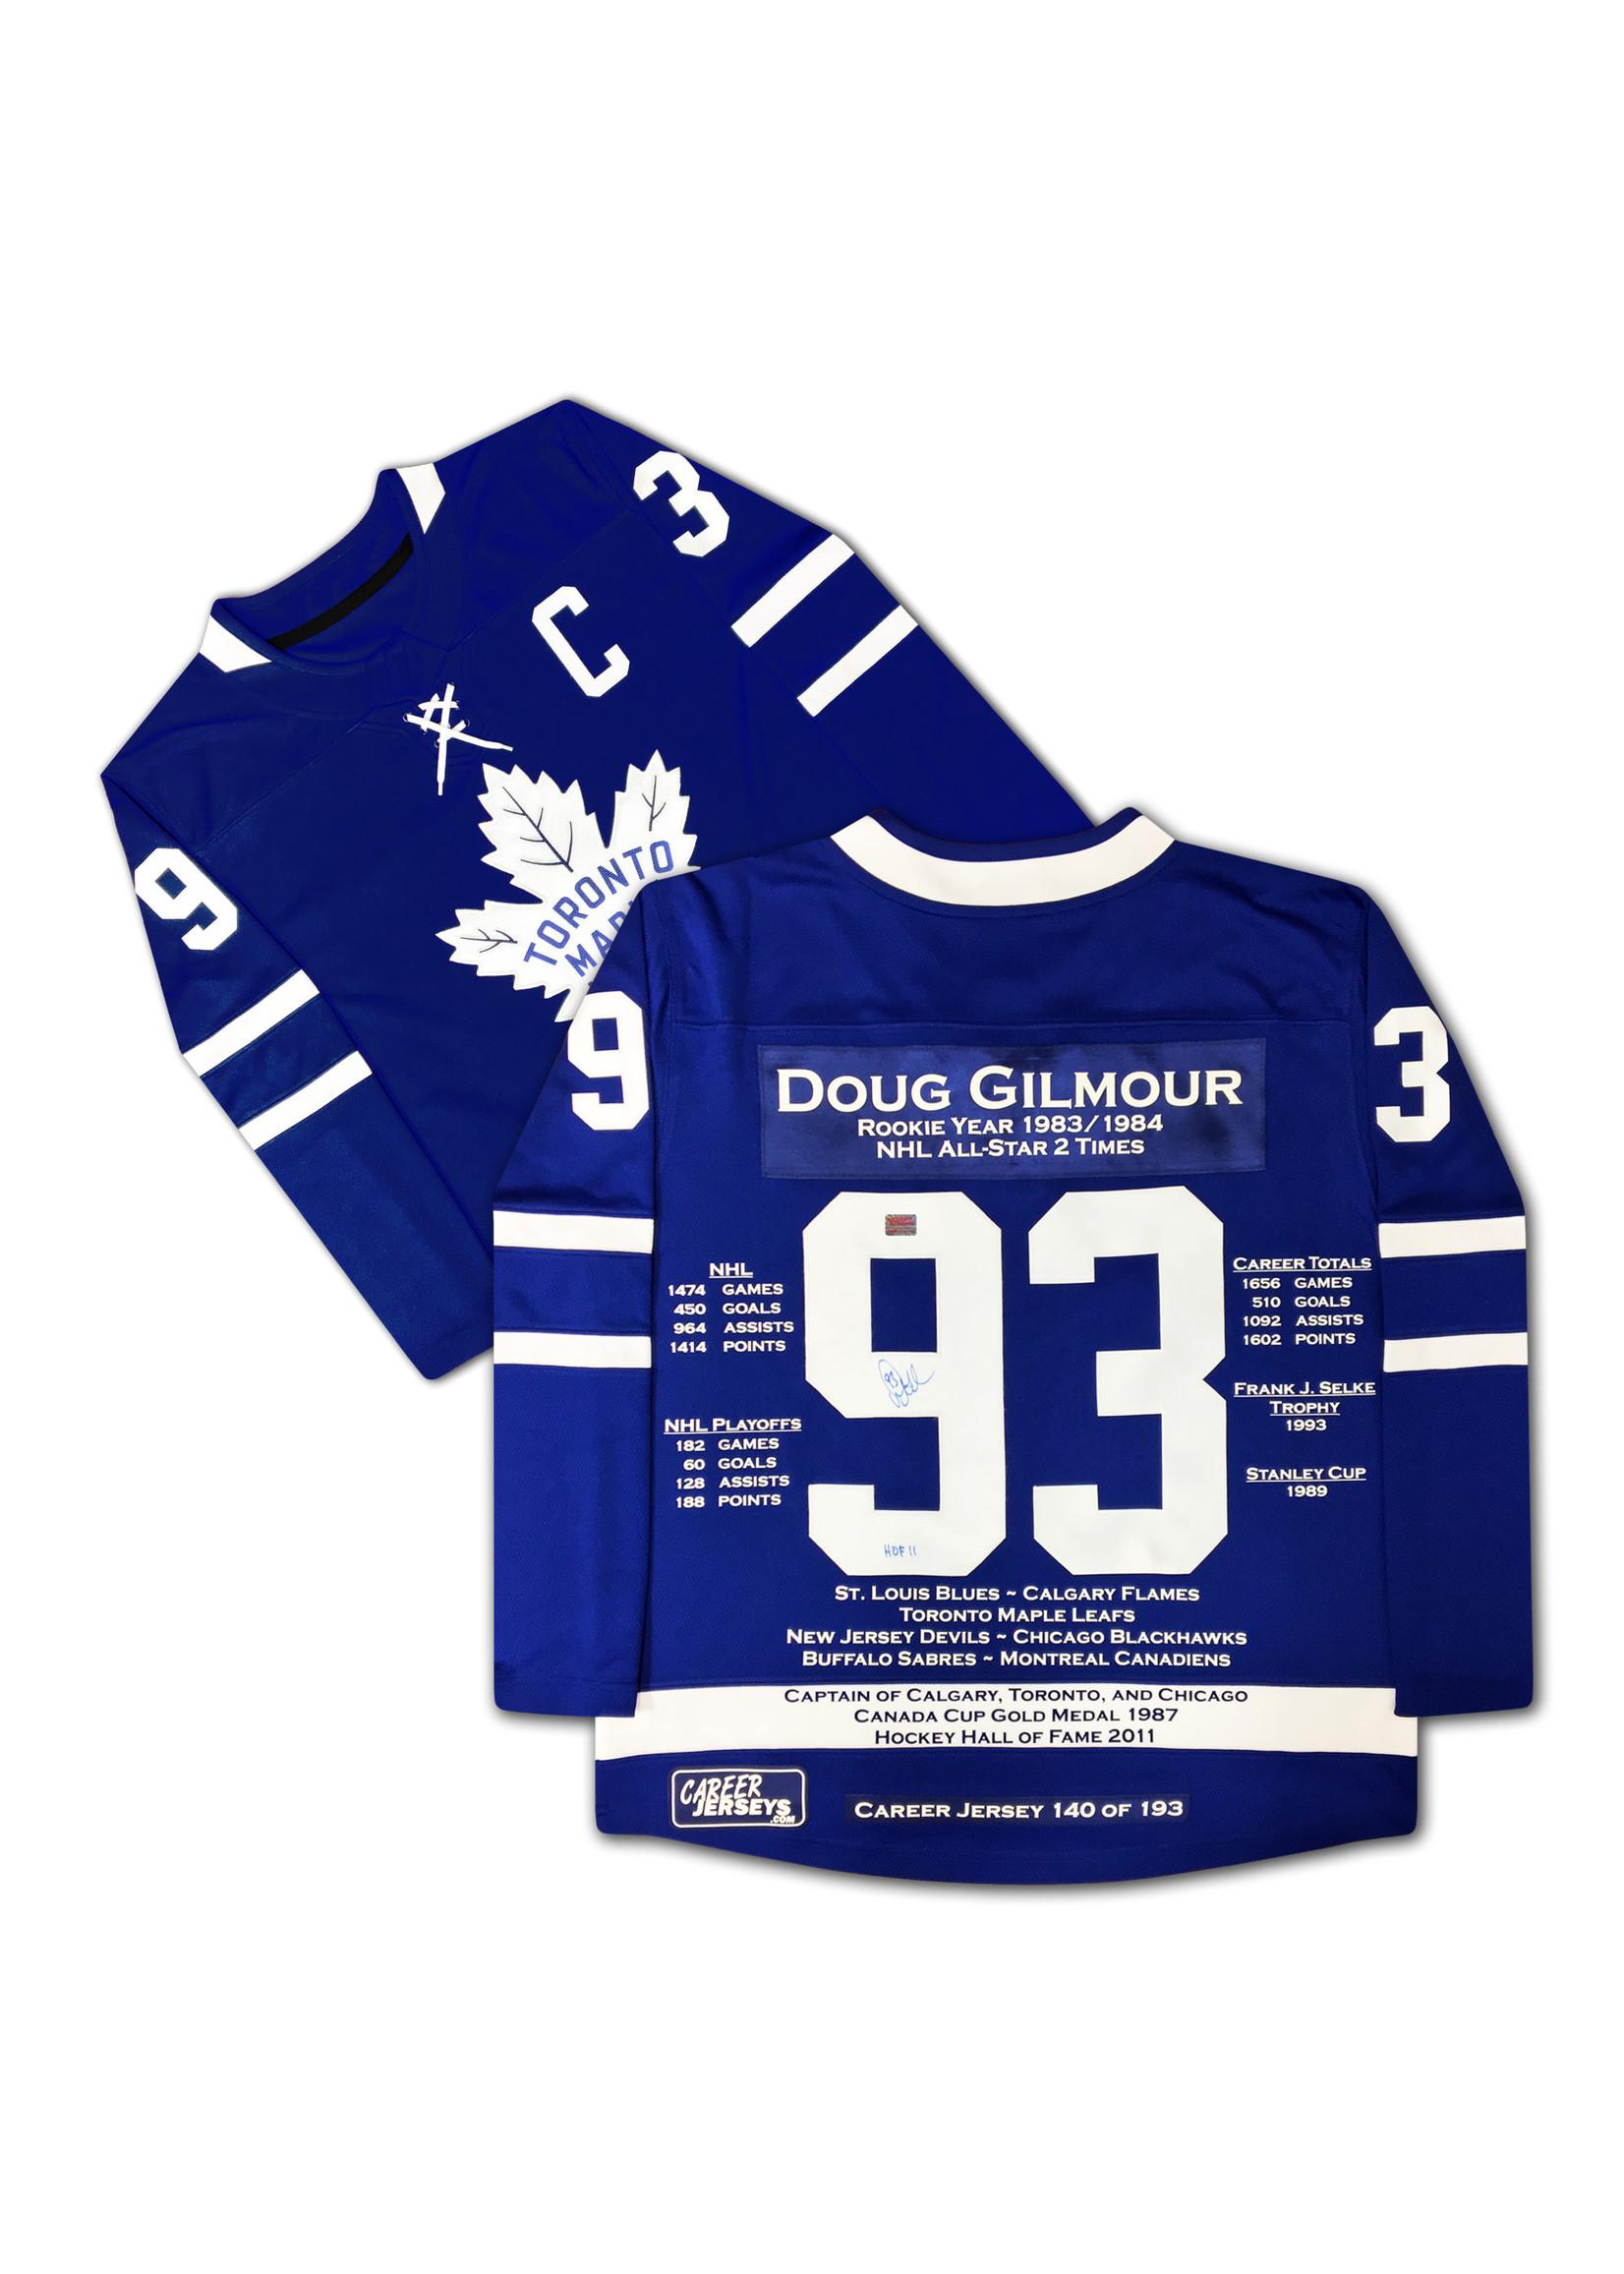 Doug Gilmour Career Jersey - Autographed - LTD ED 193 - Toronto Maple Leafs